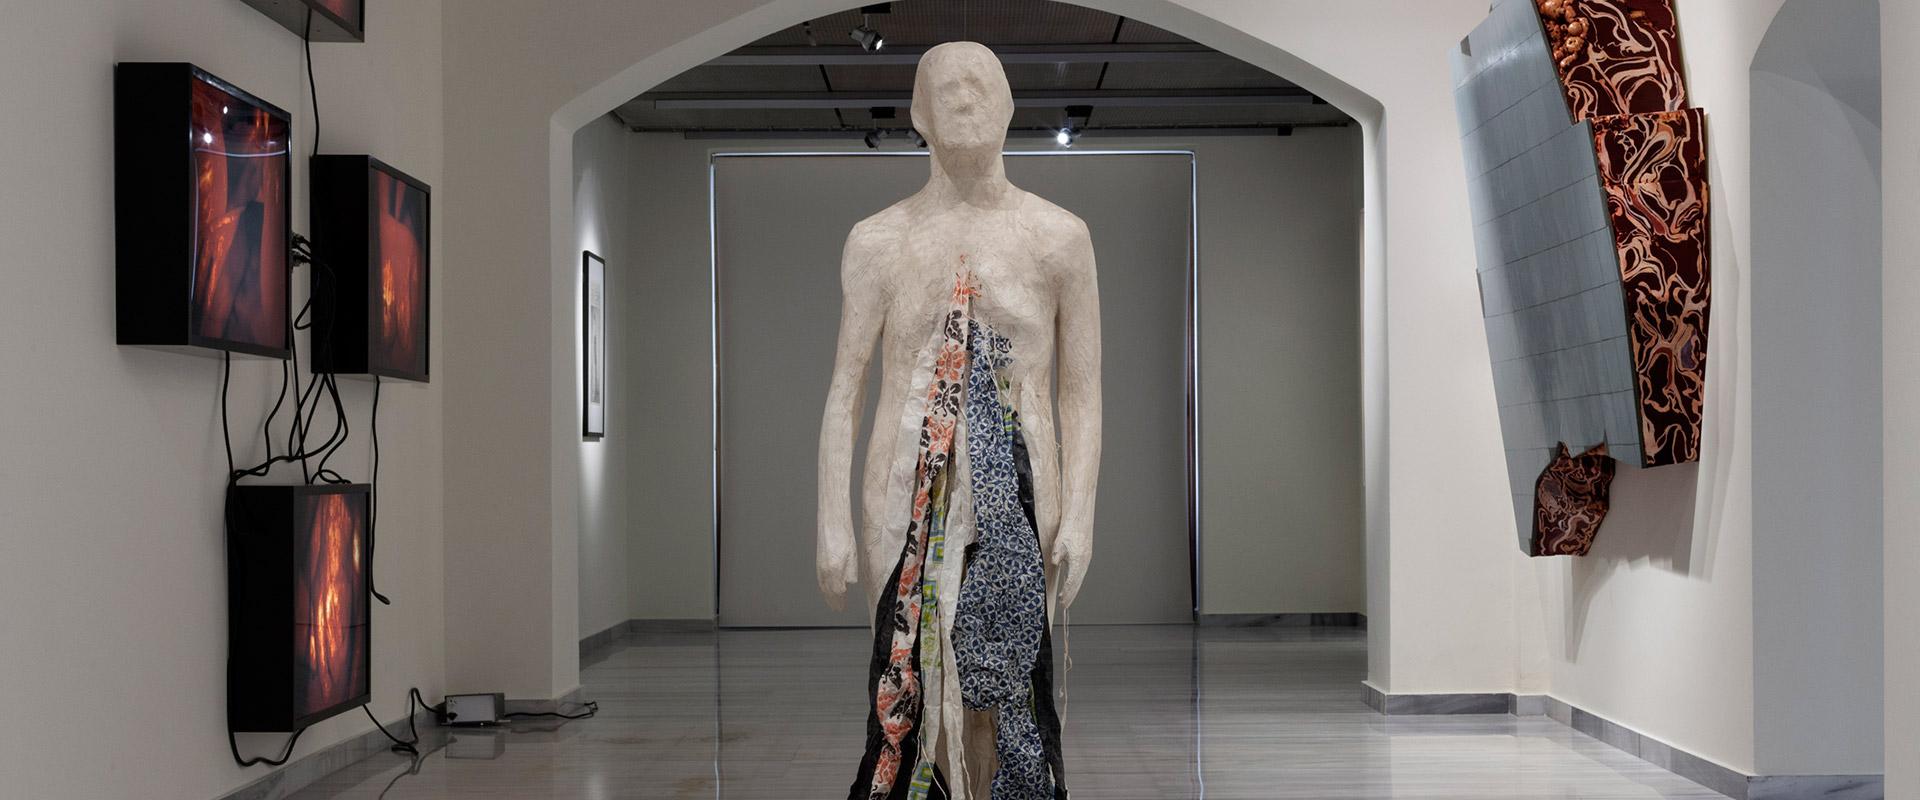 Musée d'art contemporain de Crète